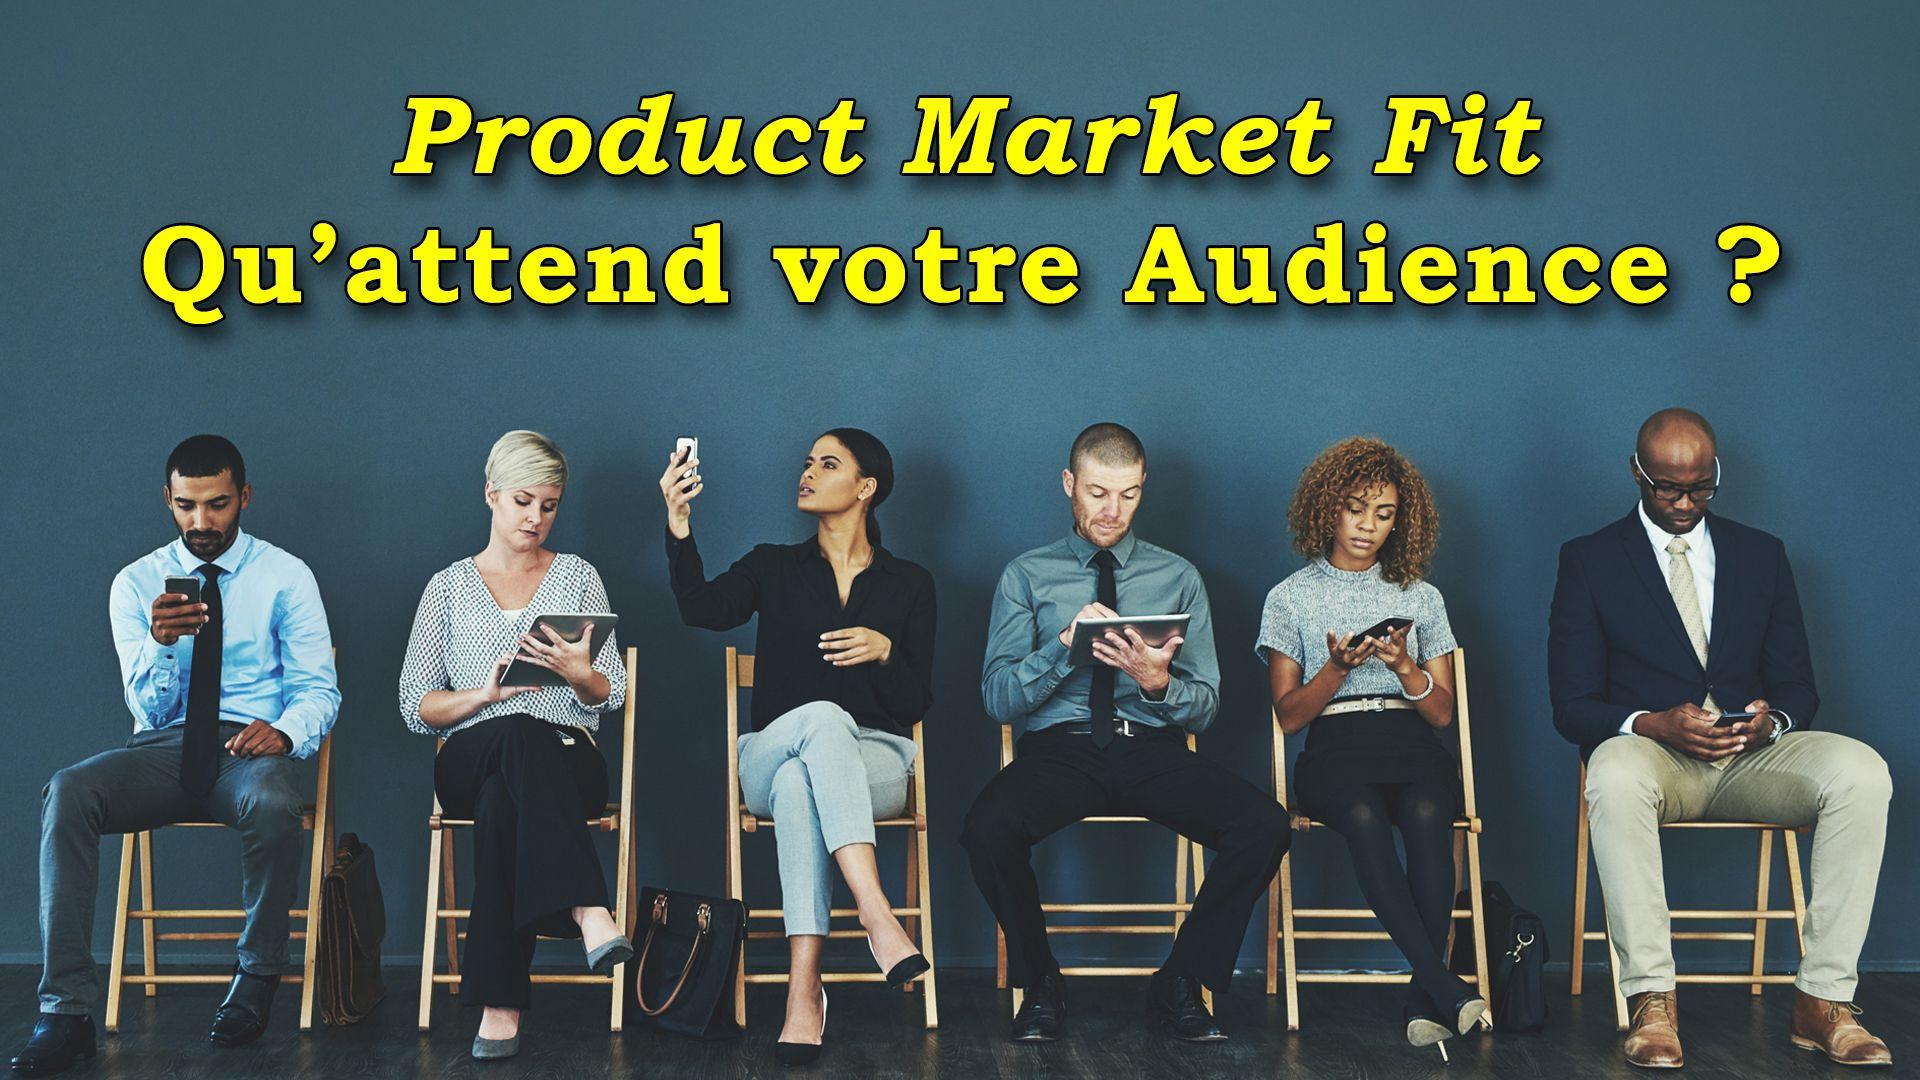 Product Market Fit : Qu'attend votre Audience ? #GrowthHacking #WebMarketing #FormationGrowthHacking #CentreDeFormationFrance #TunnelAARRR #AARRR #SocialMedia #CommunityManagement #SEO